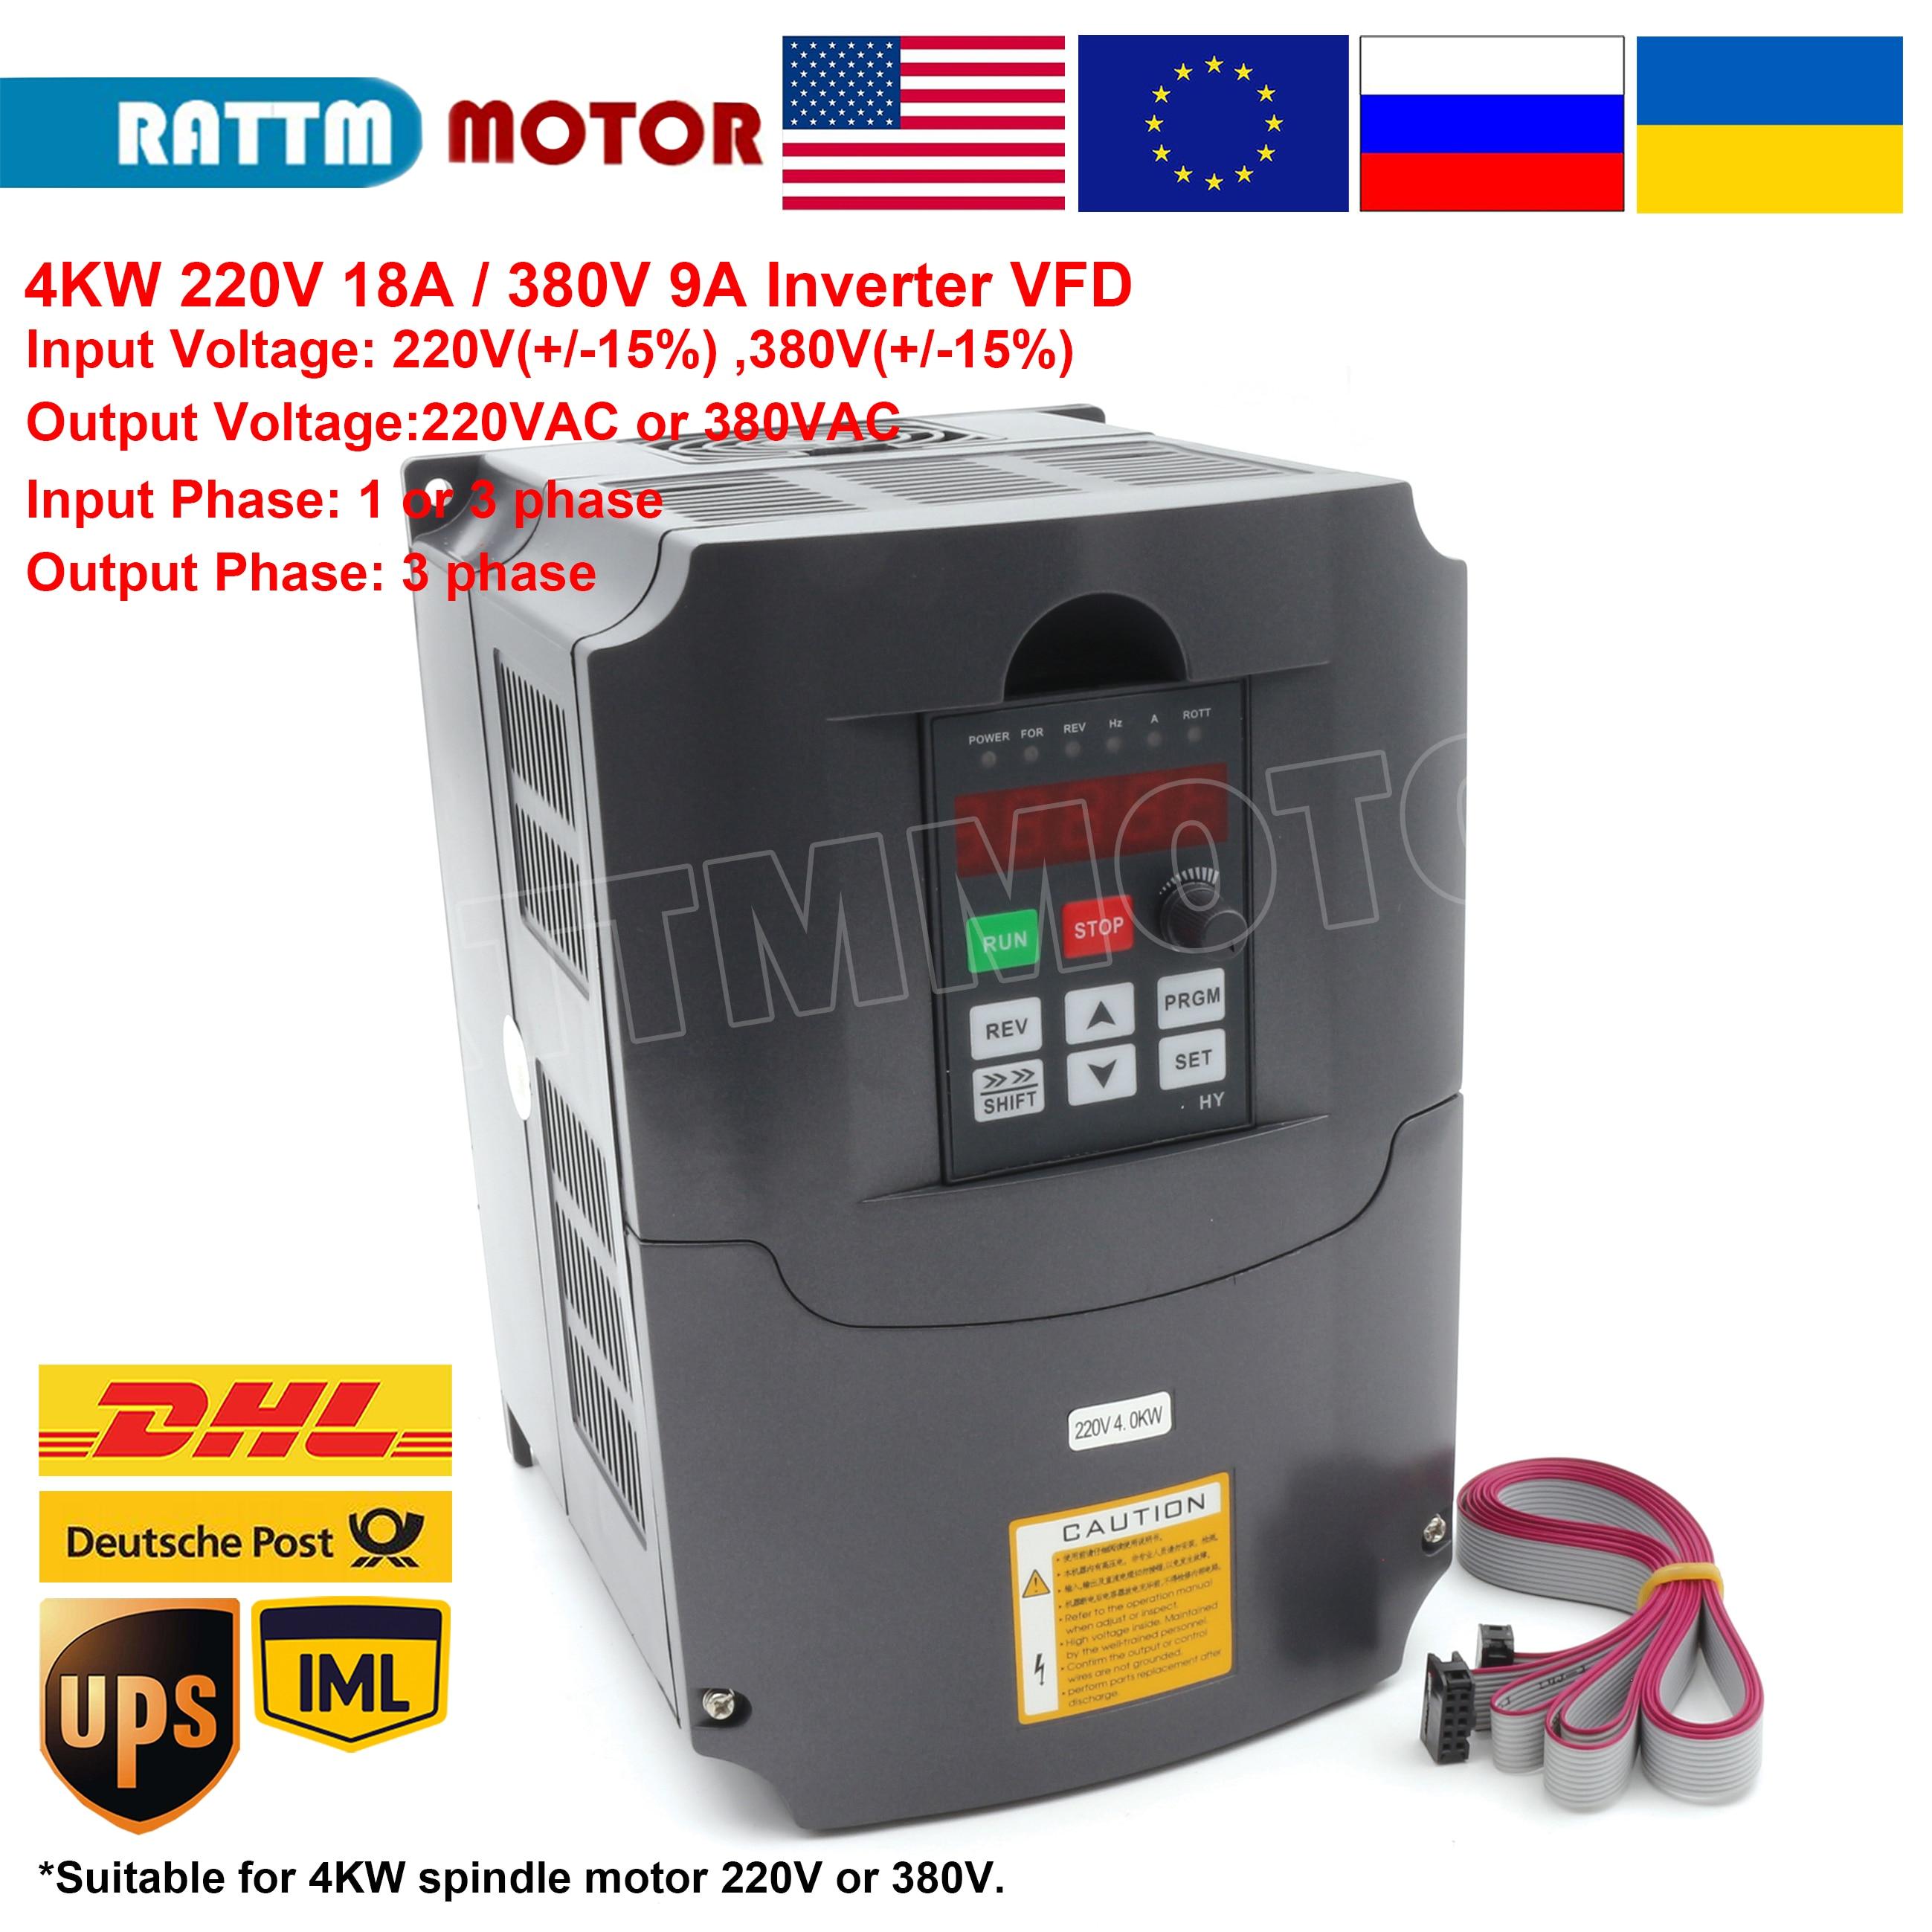 4KW 220V or 380V inverter VFD 3 phase Output Frequency Converter Adjustable Speed 400Hz 18A/9A Speed control